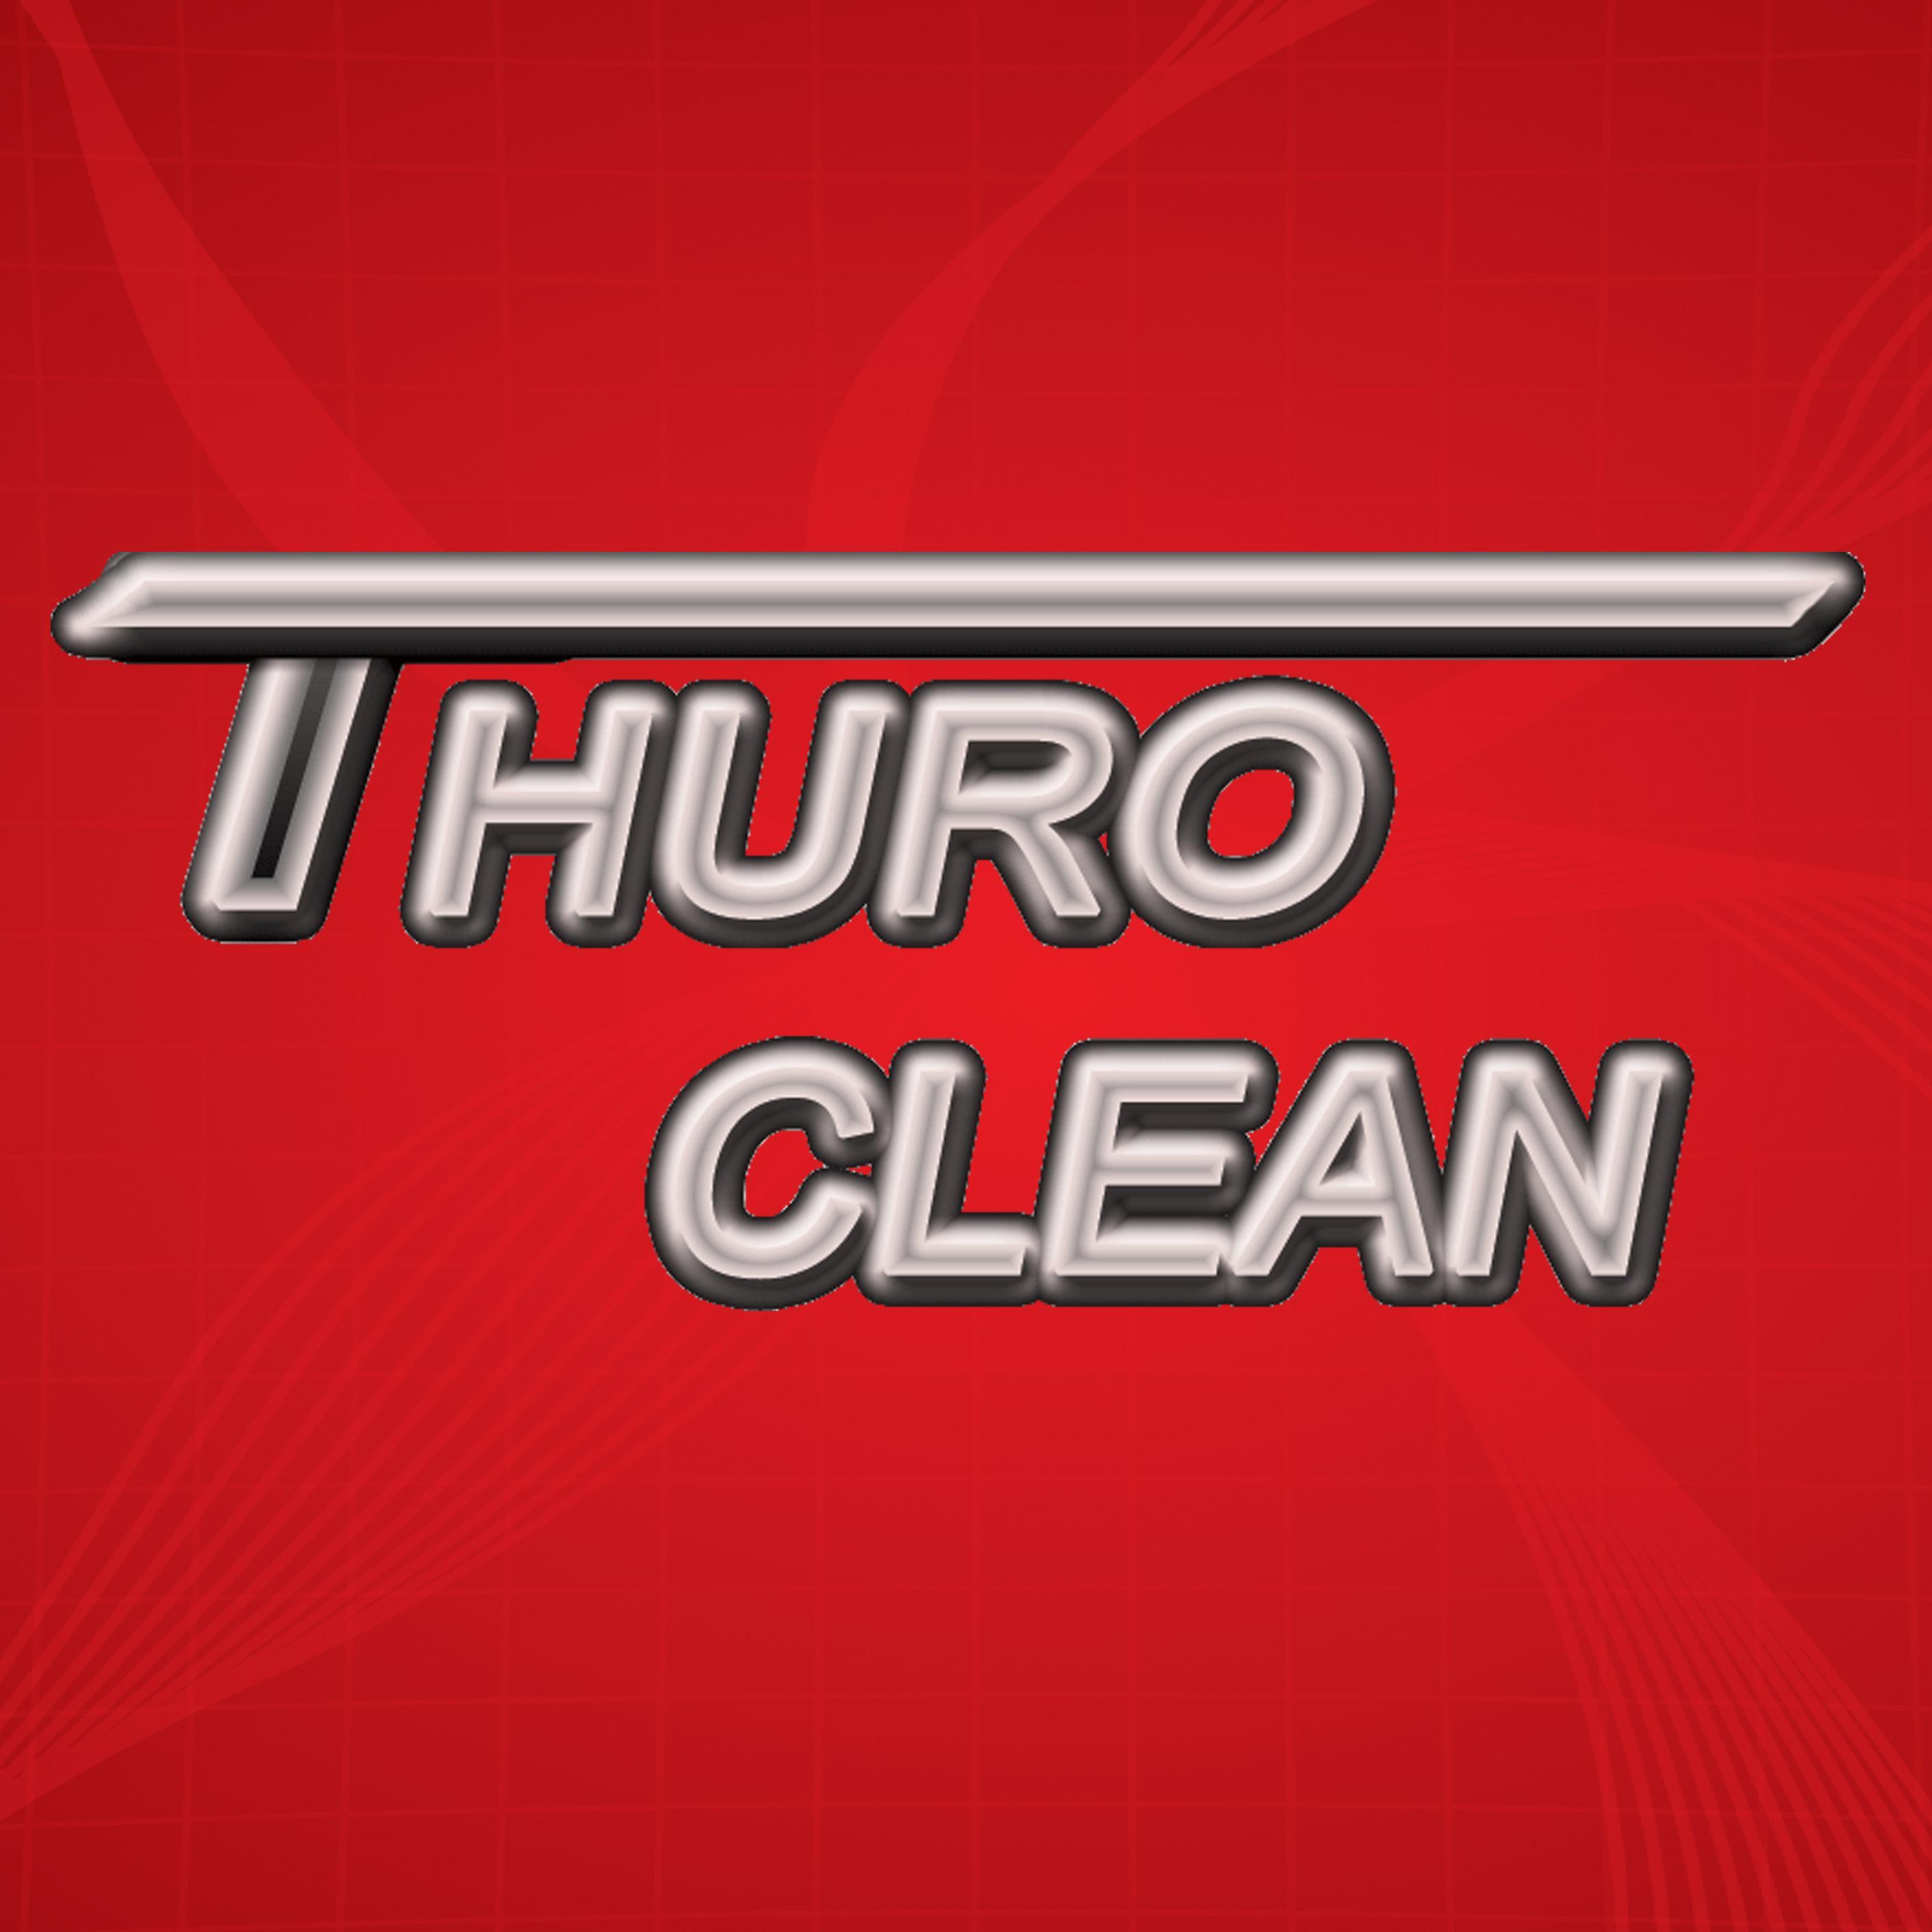 Thuro Clean Carpet & Upholstery LLC